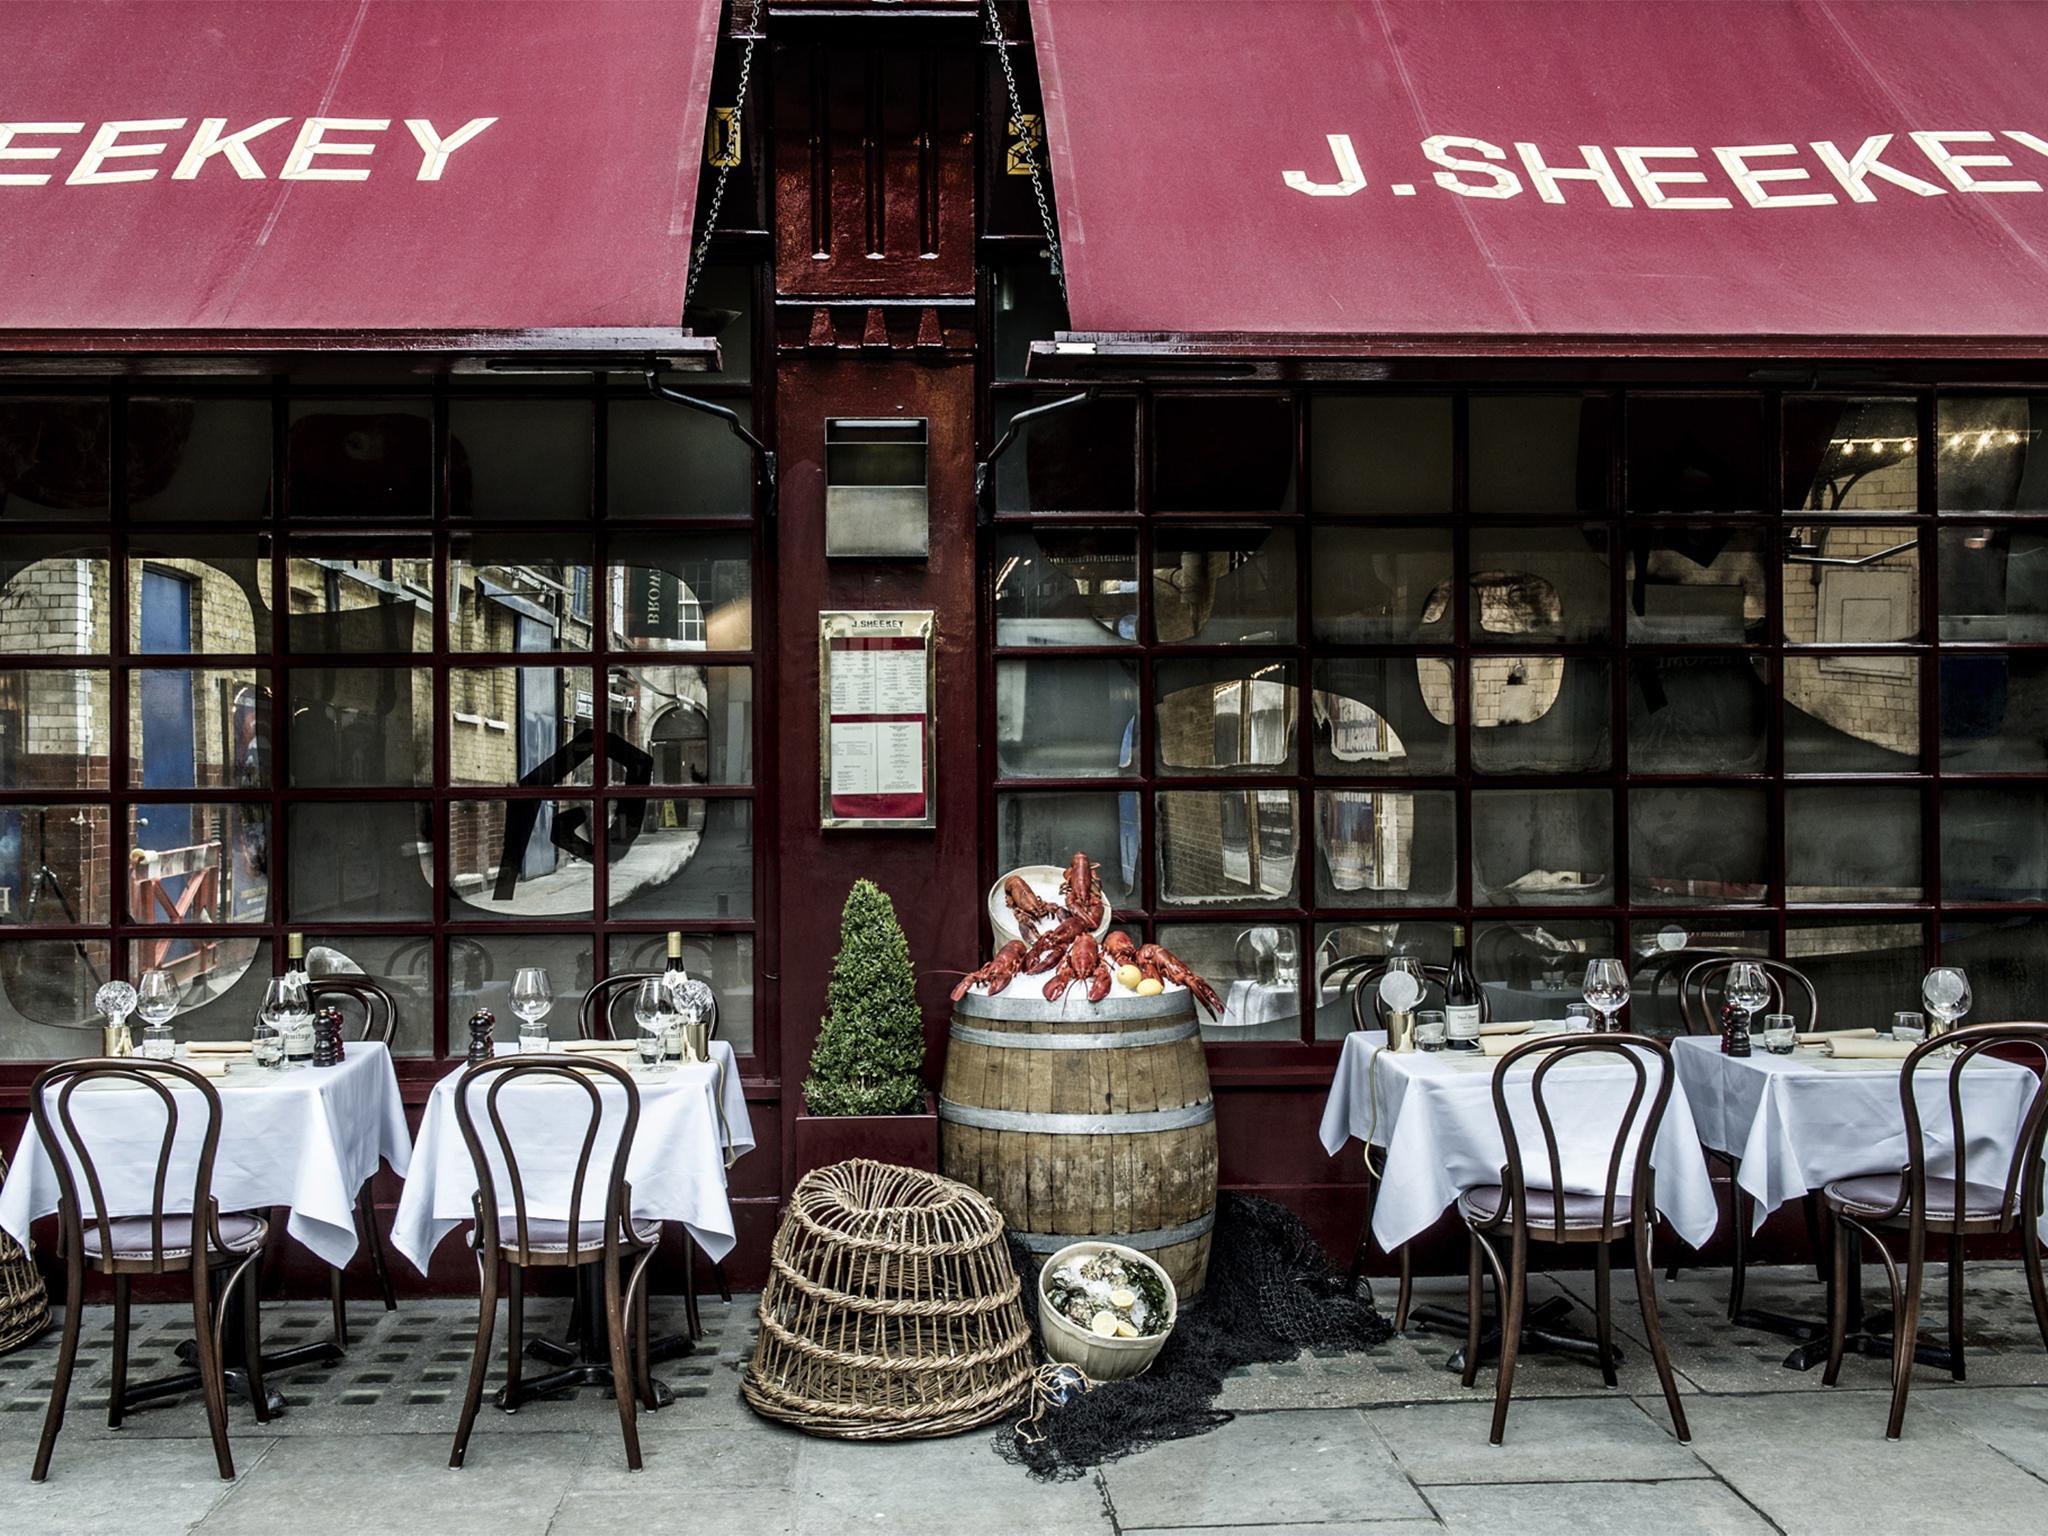 J Sheekey Oyster Bar